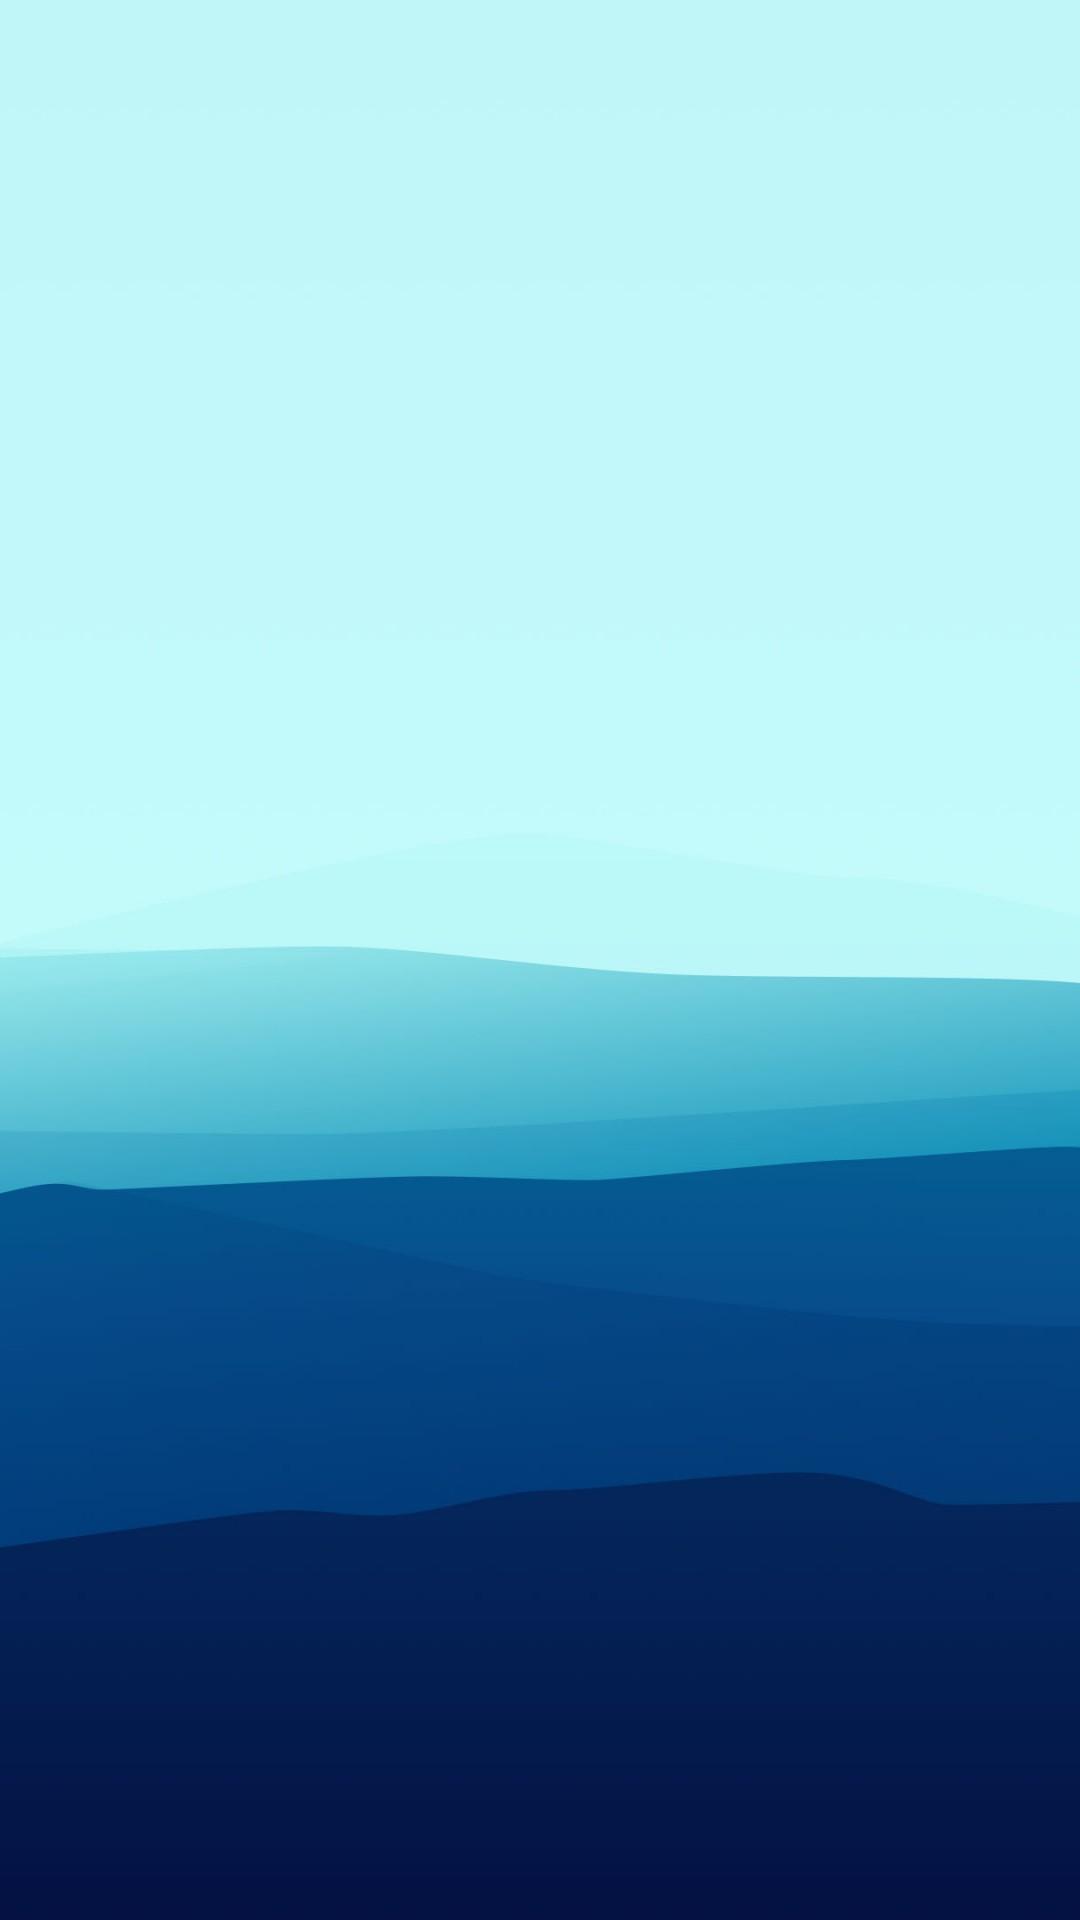 обои лес туман 4k 5k Iphone обои голубой Landscape